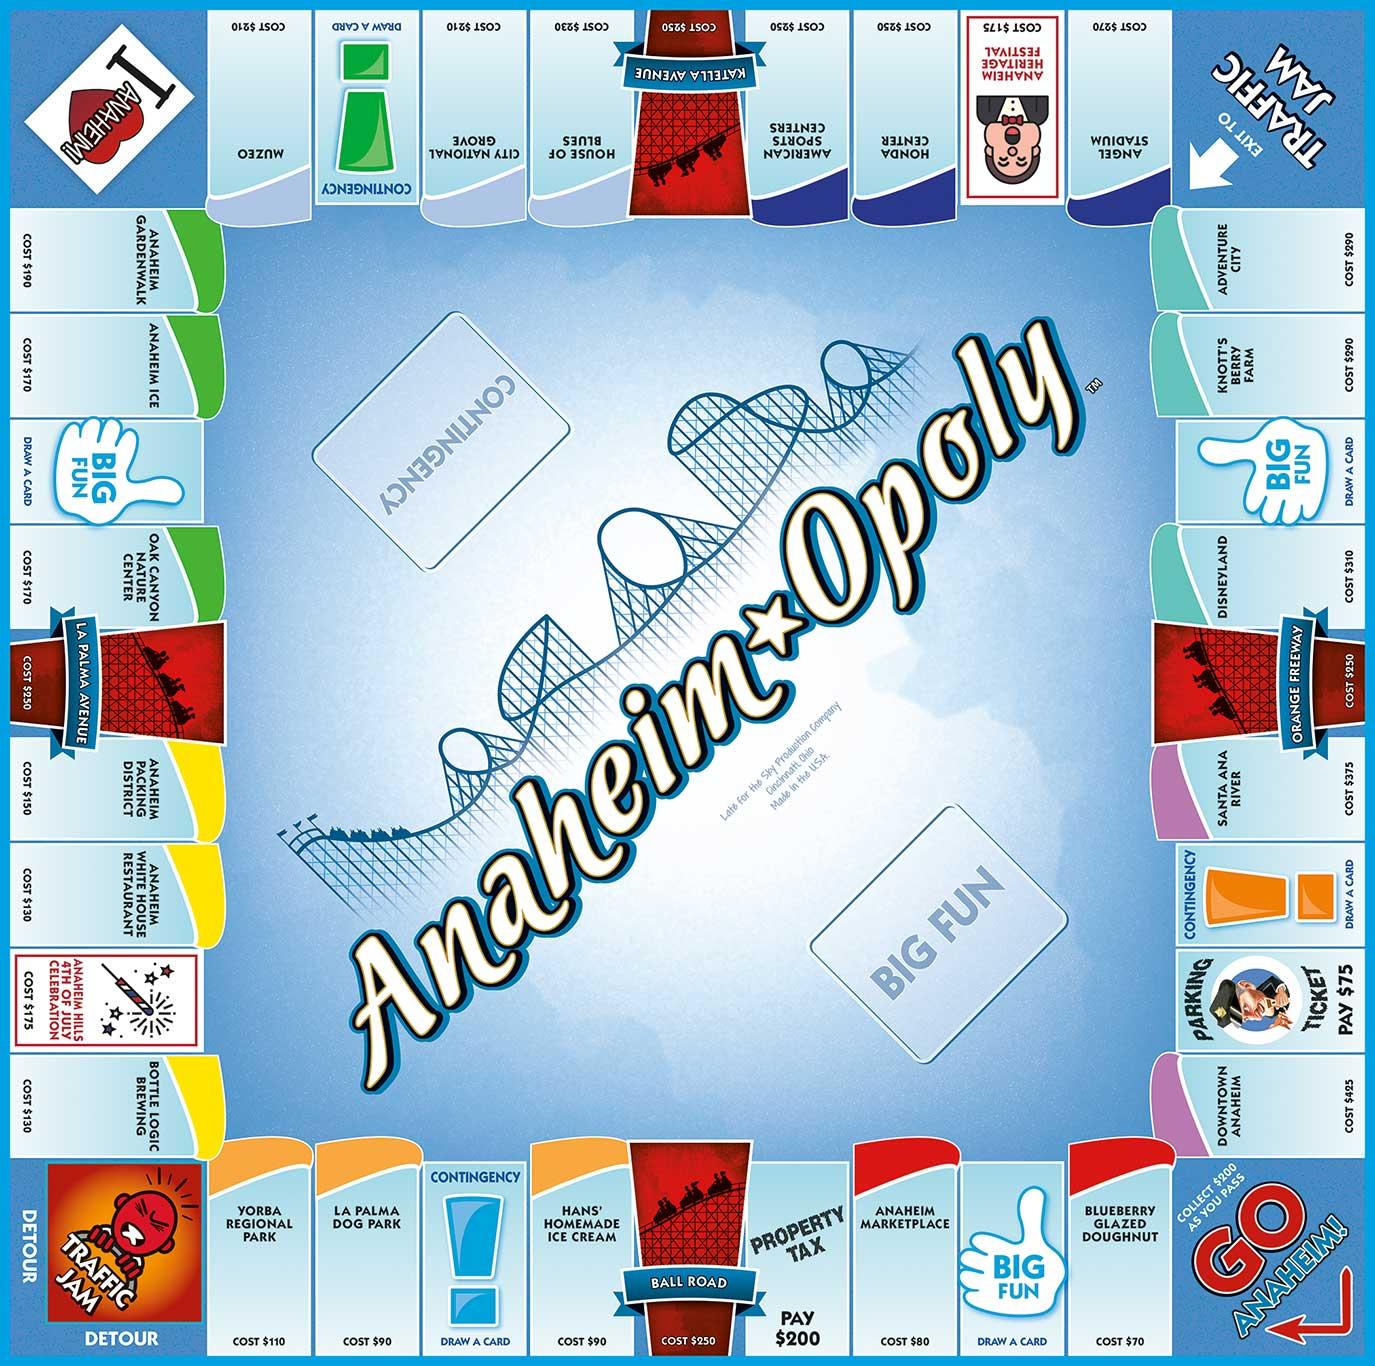 ANAHEIM-OPOLY Board Game